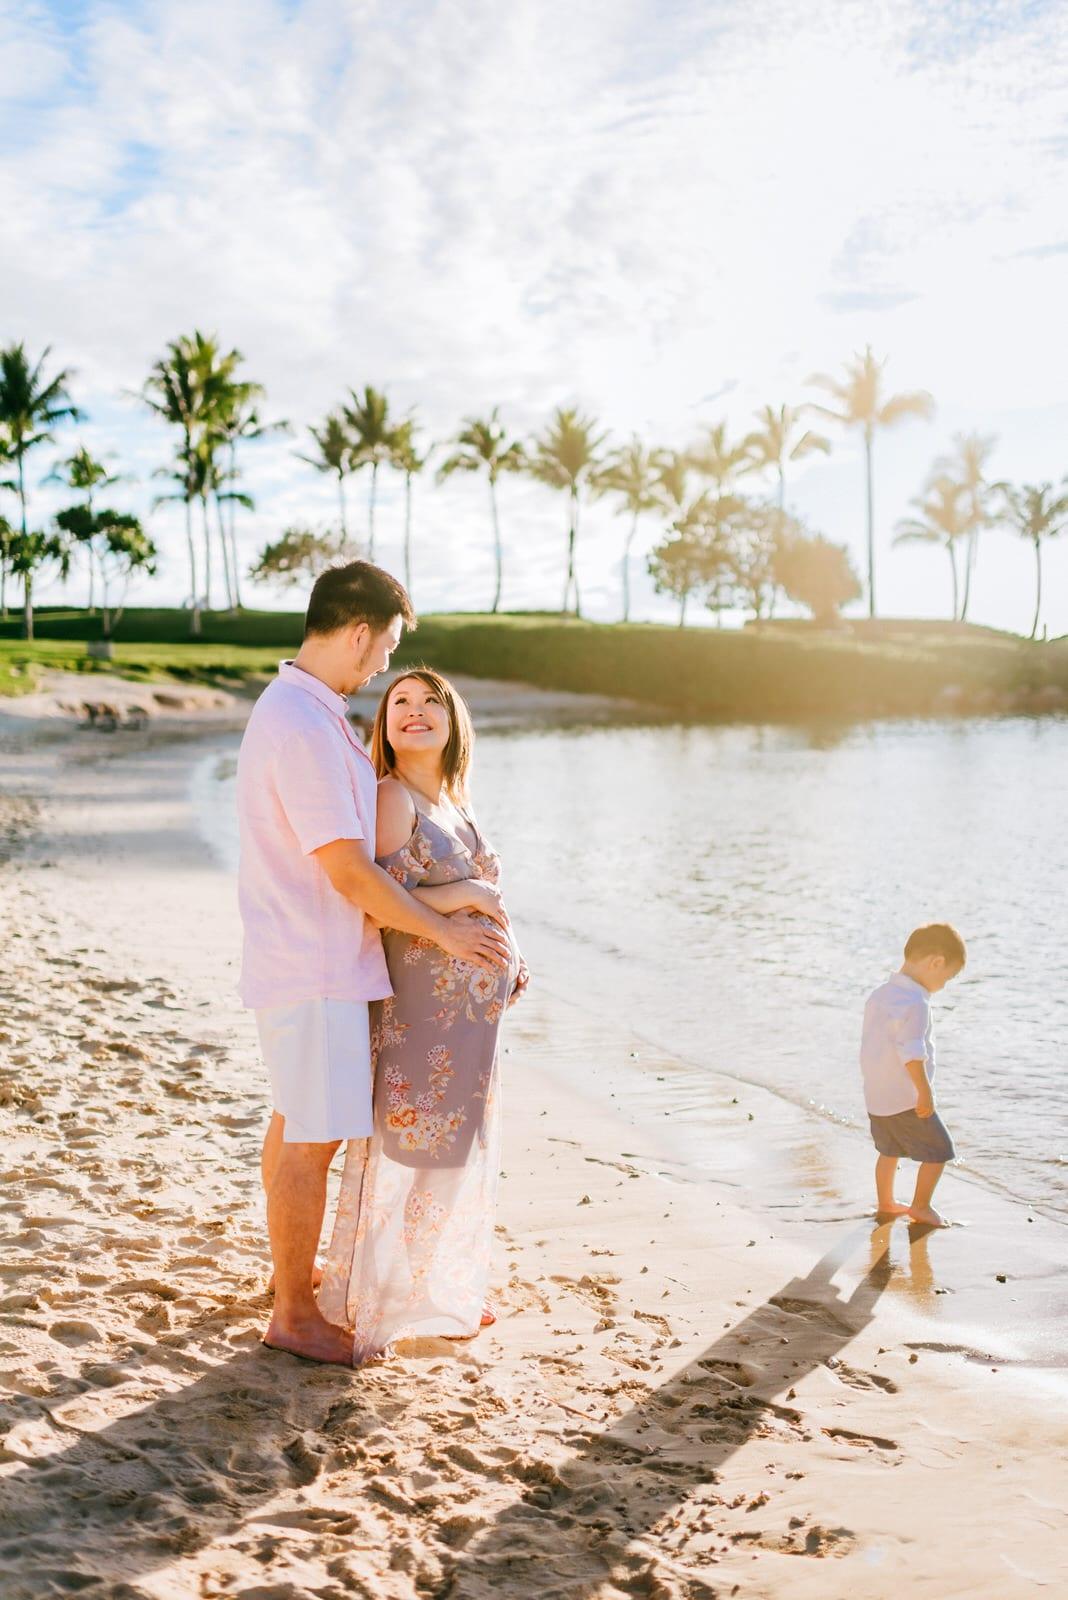 Kona-Photographer-Hawaii-Family-Photos-17.jpg